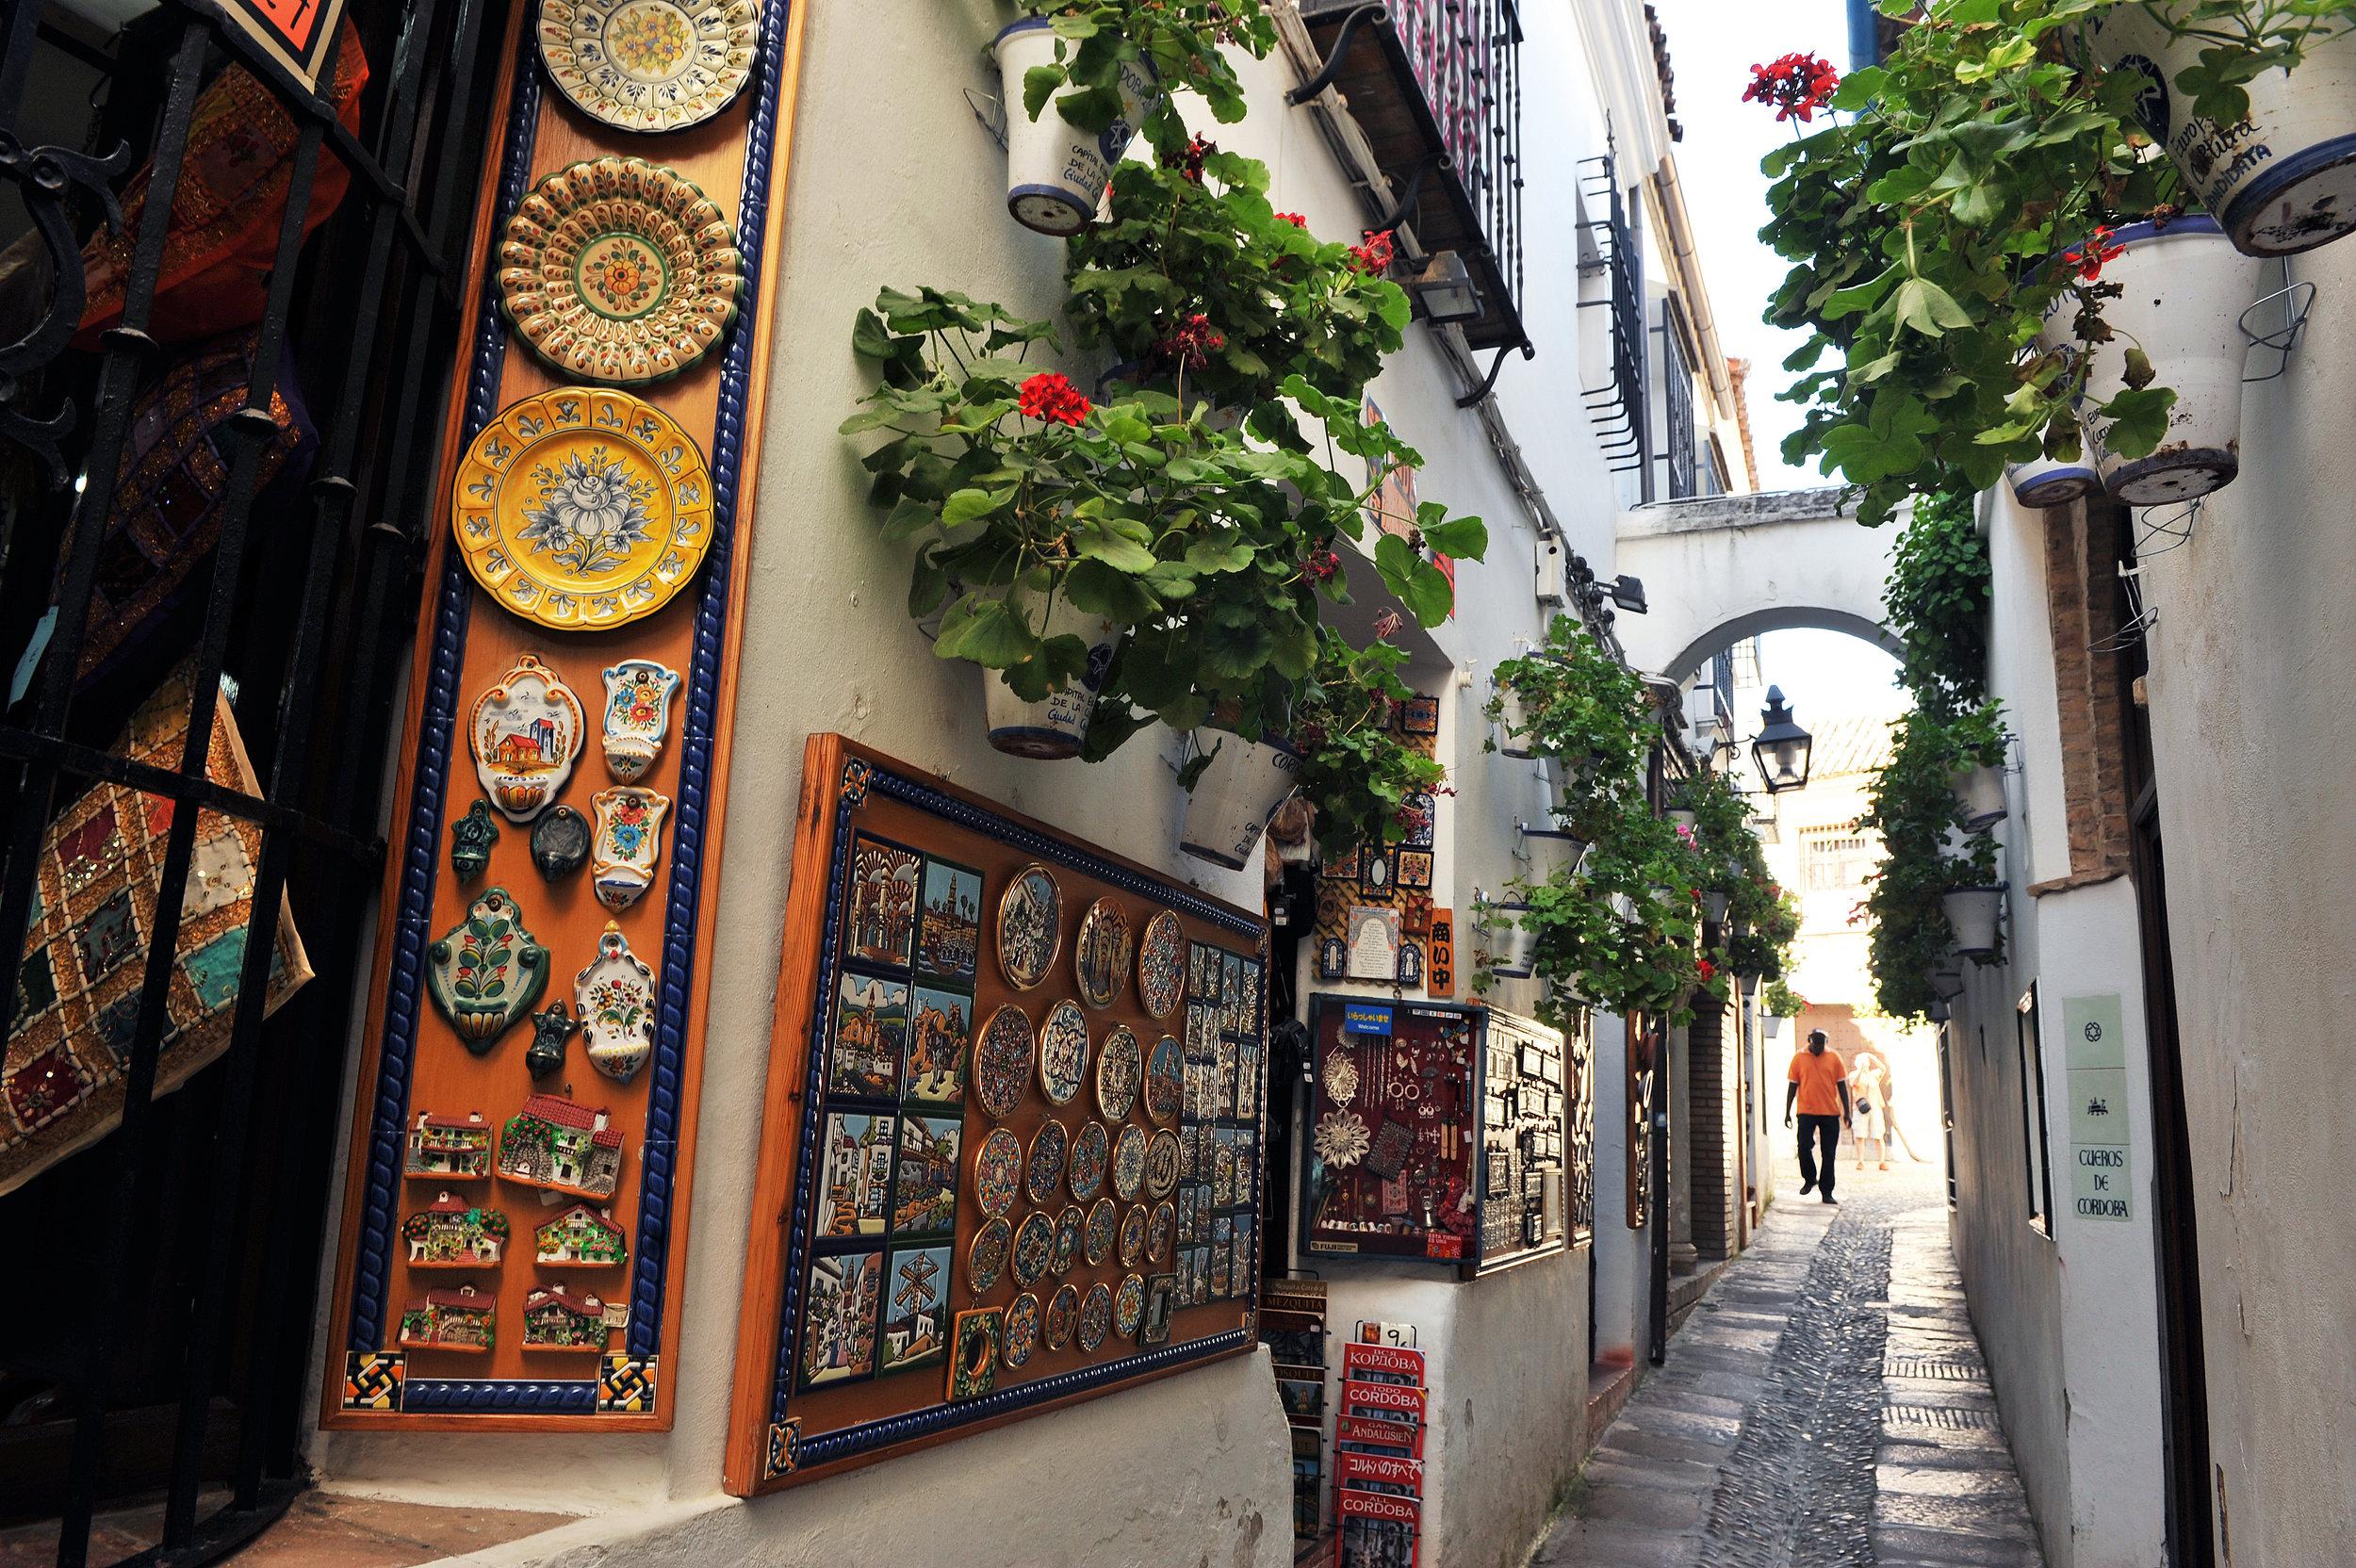 Streets scenes from the Judería